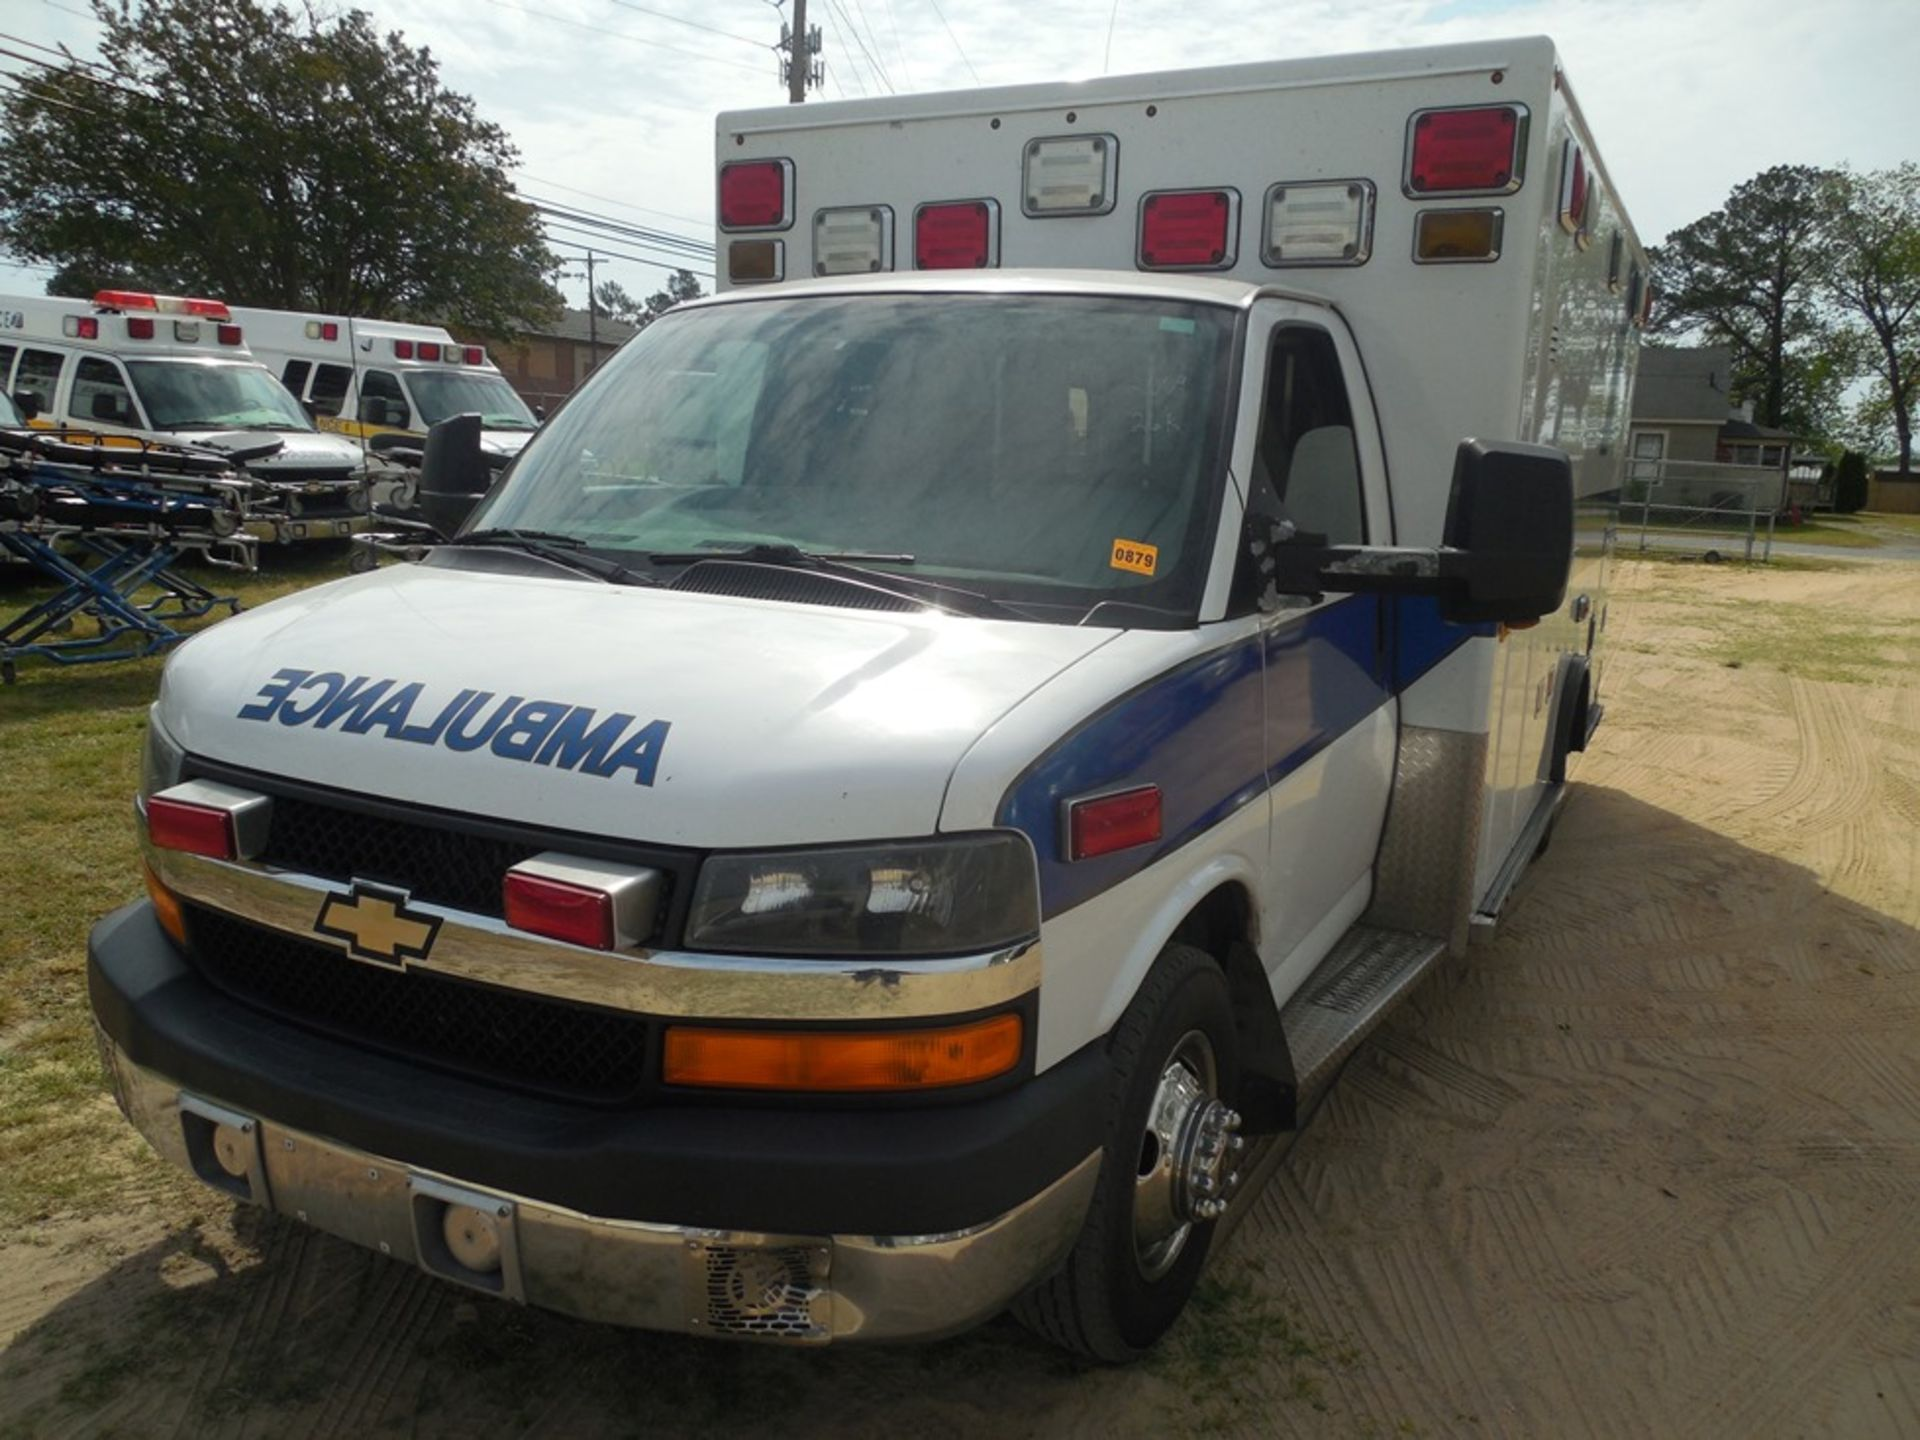 2009 Chev 4500 dsl, box ambulance 226,356 miles vin# 1GBKG316191158061 - Image 2 of 6